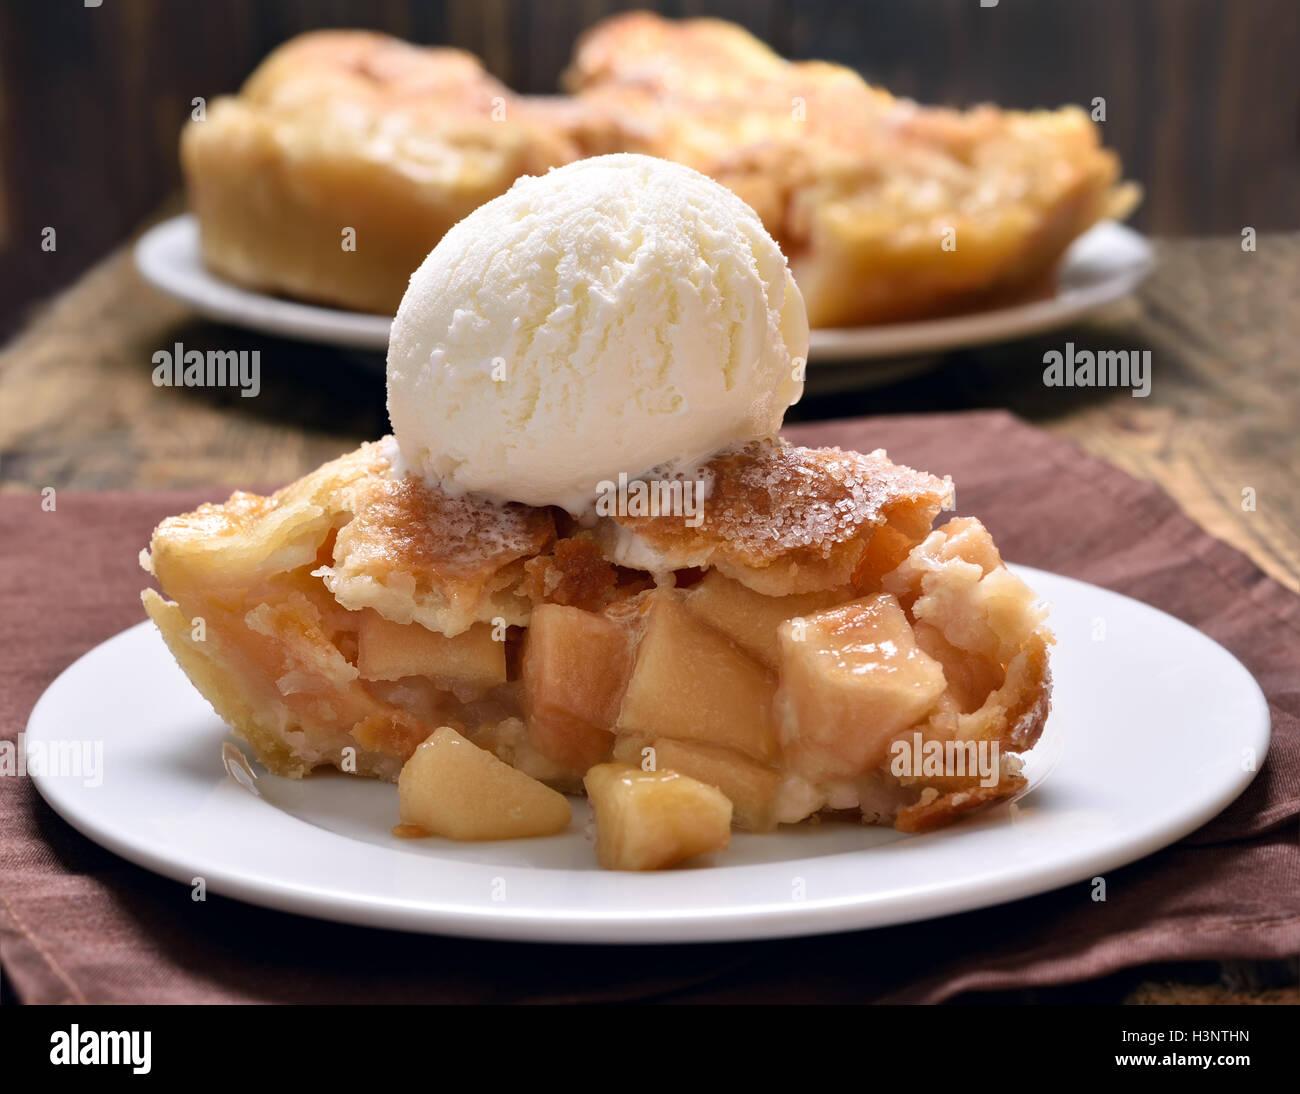 Stück Apfelstrudel mit Eis serviert, Nahaufnahme Stockbild